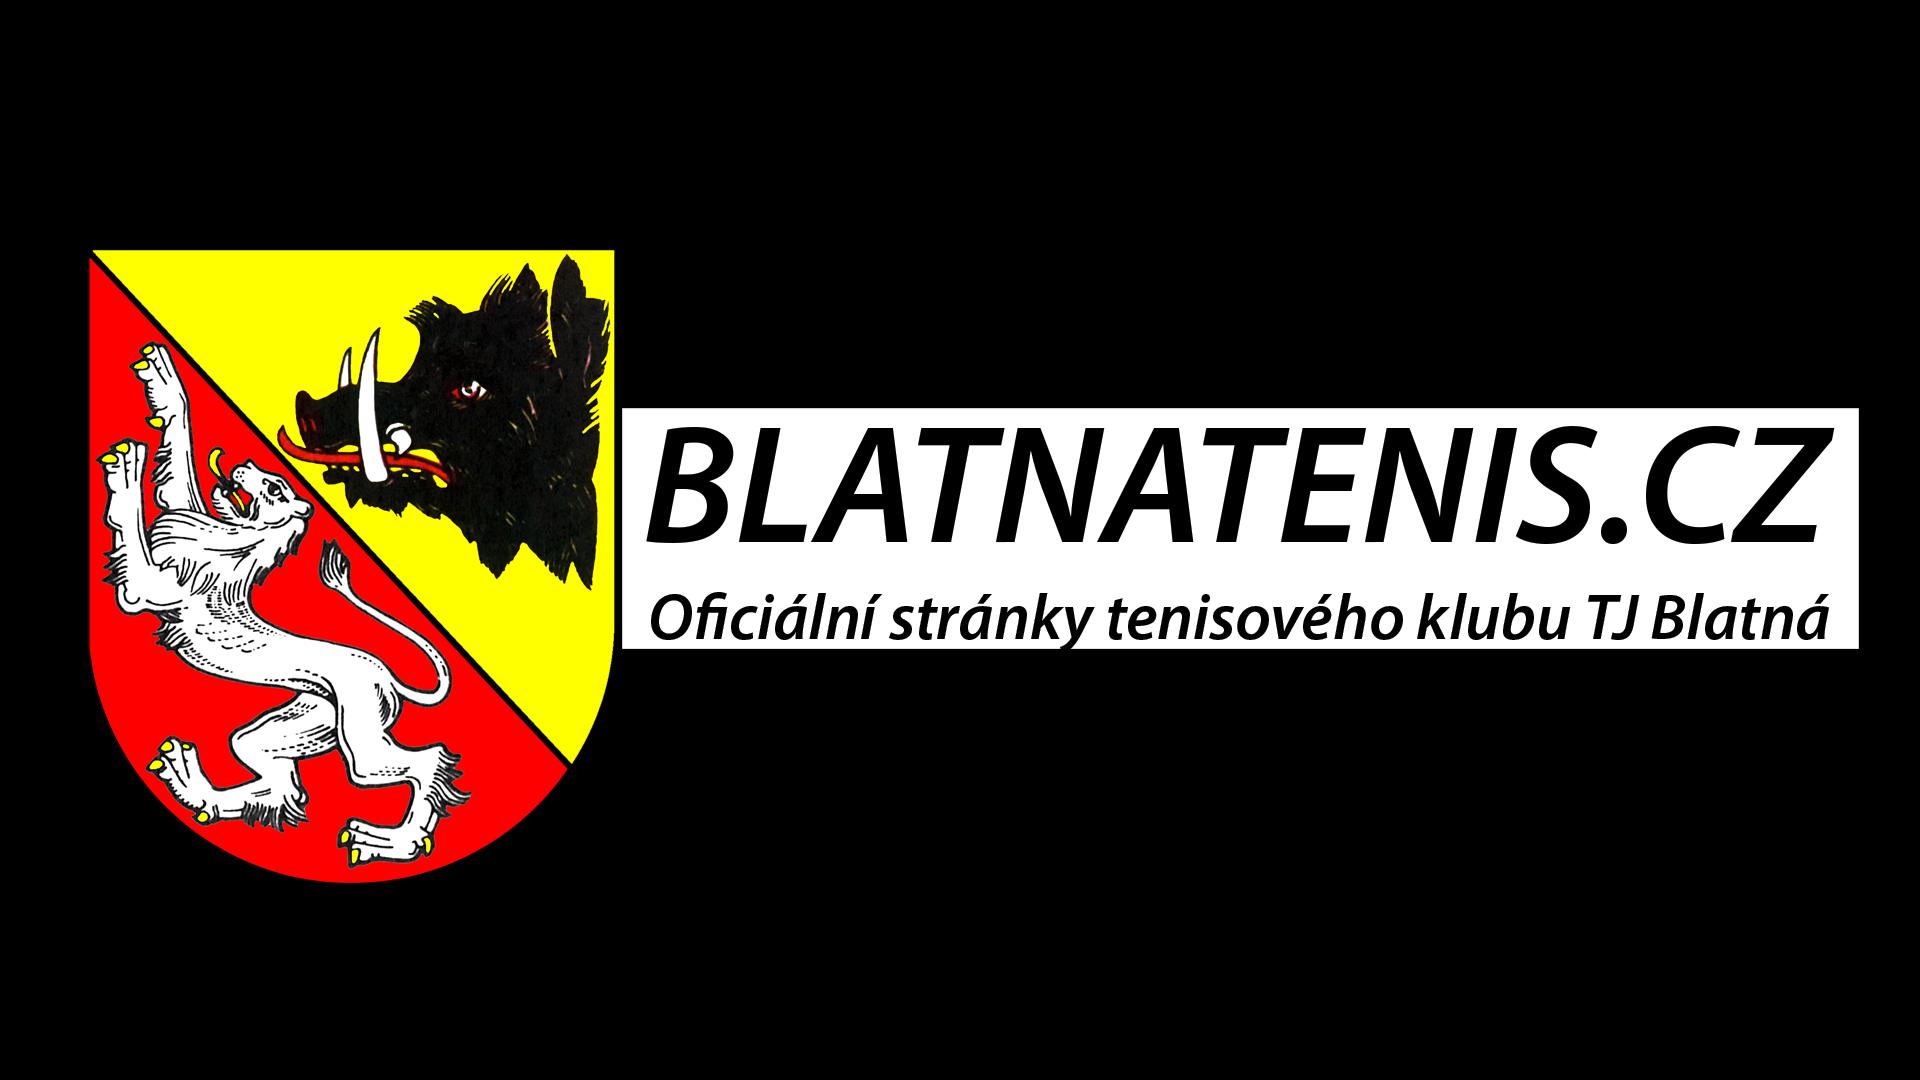 blatnatenis.cz